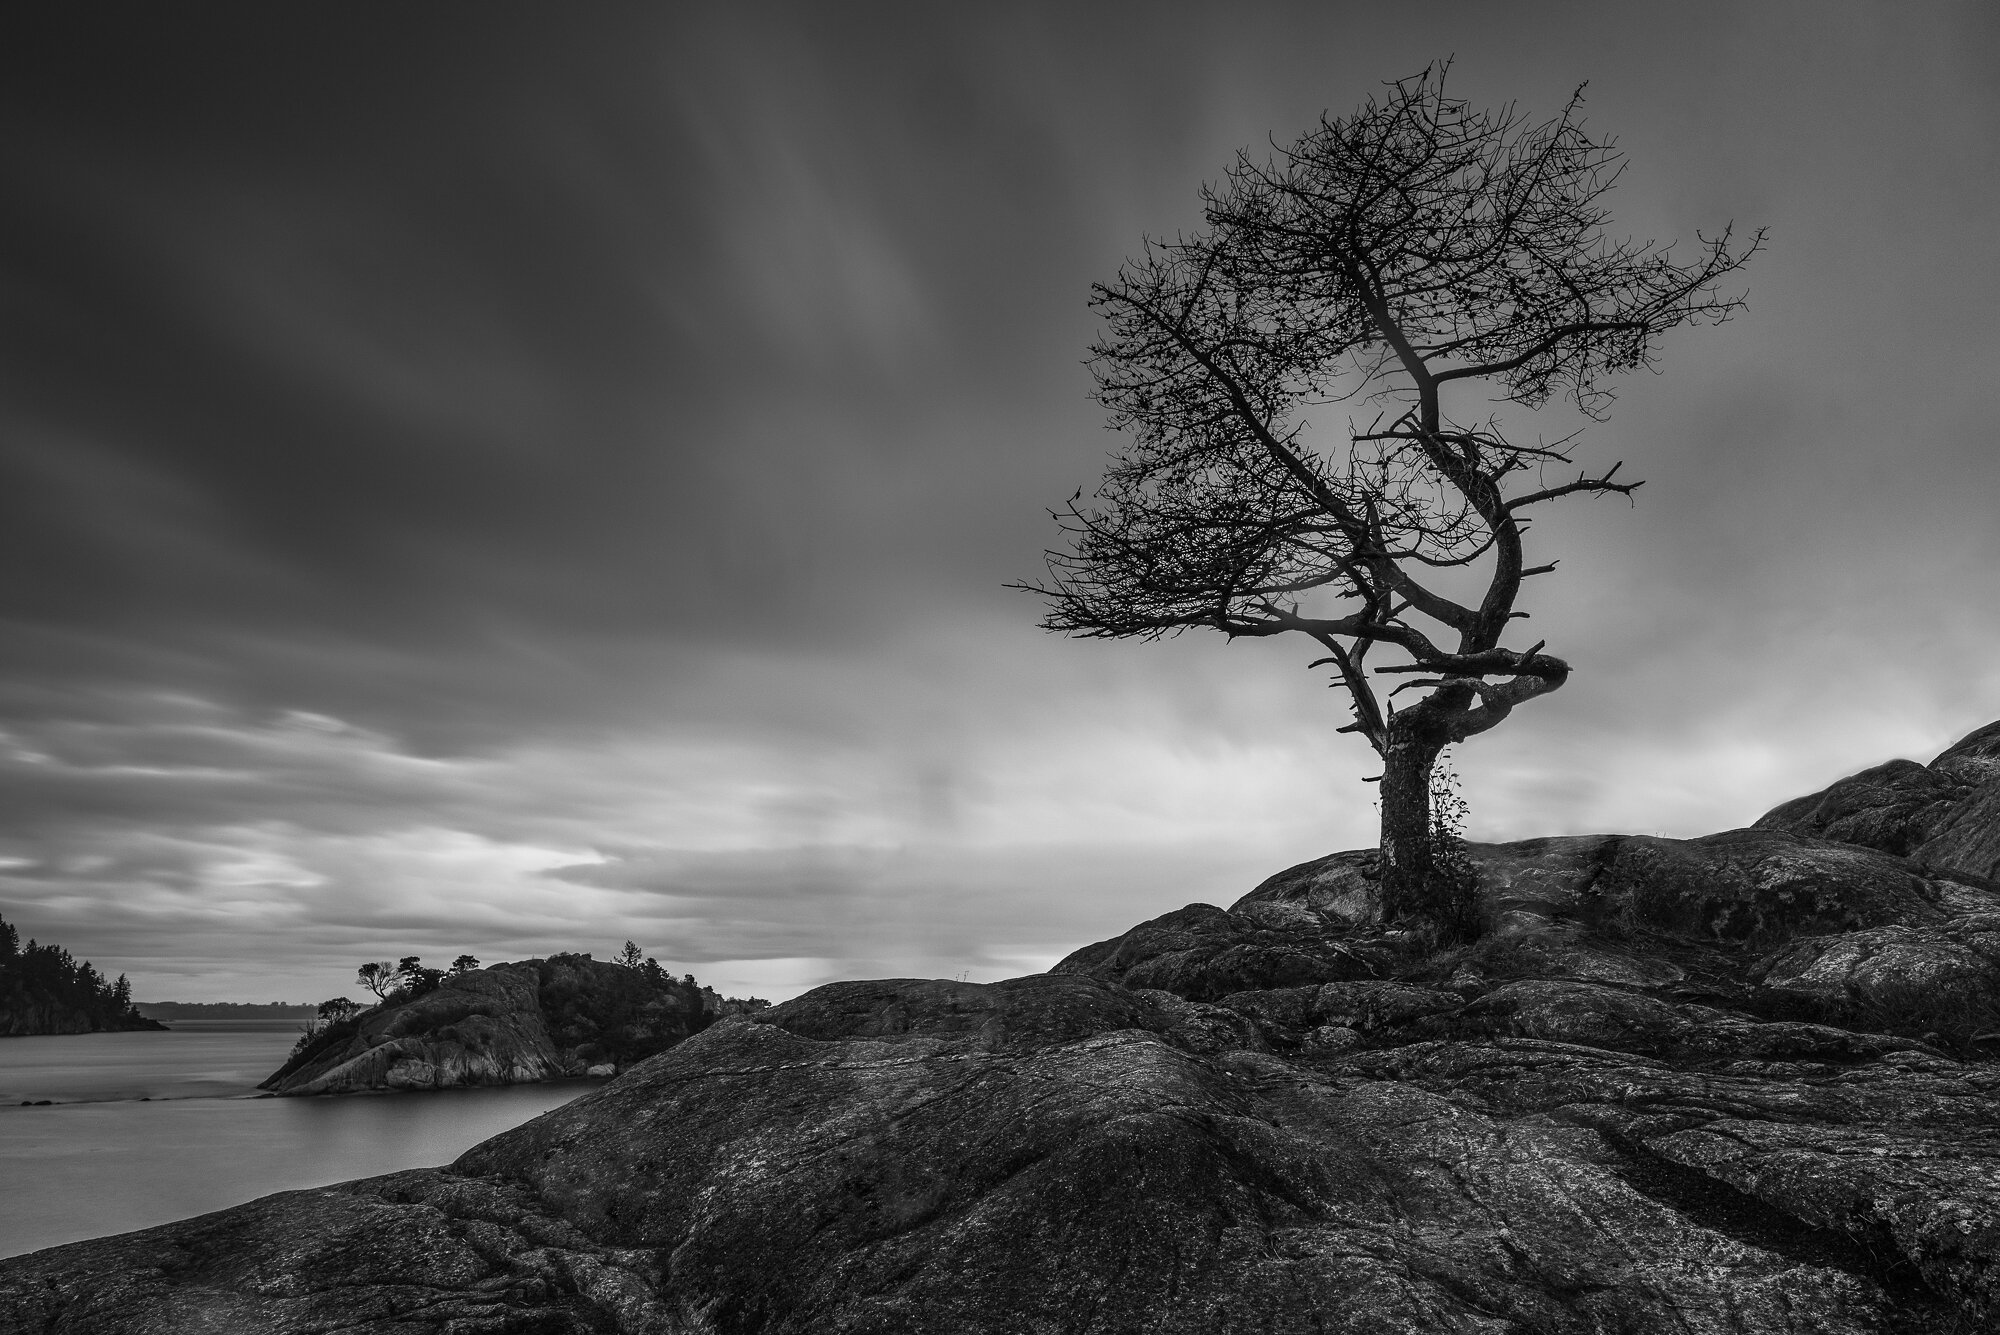 Fine Art Photography: 'The Lone Tree'